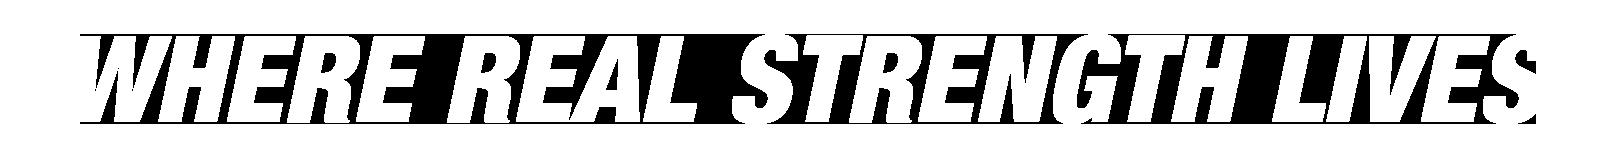 Western Bulldogs Header Branding